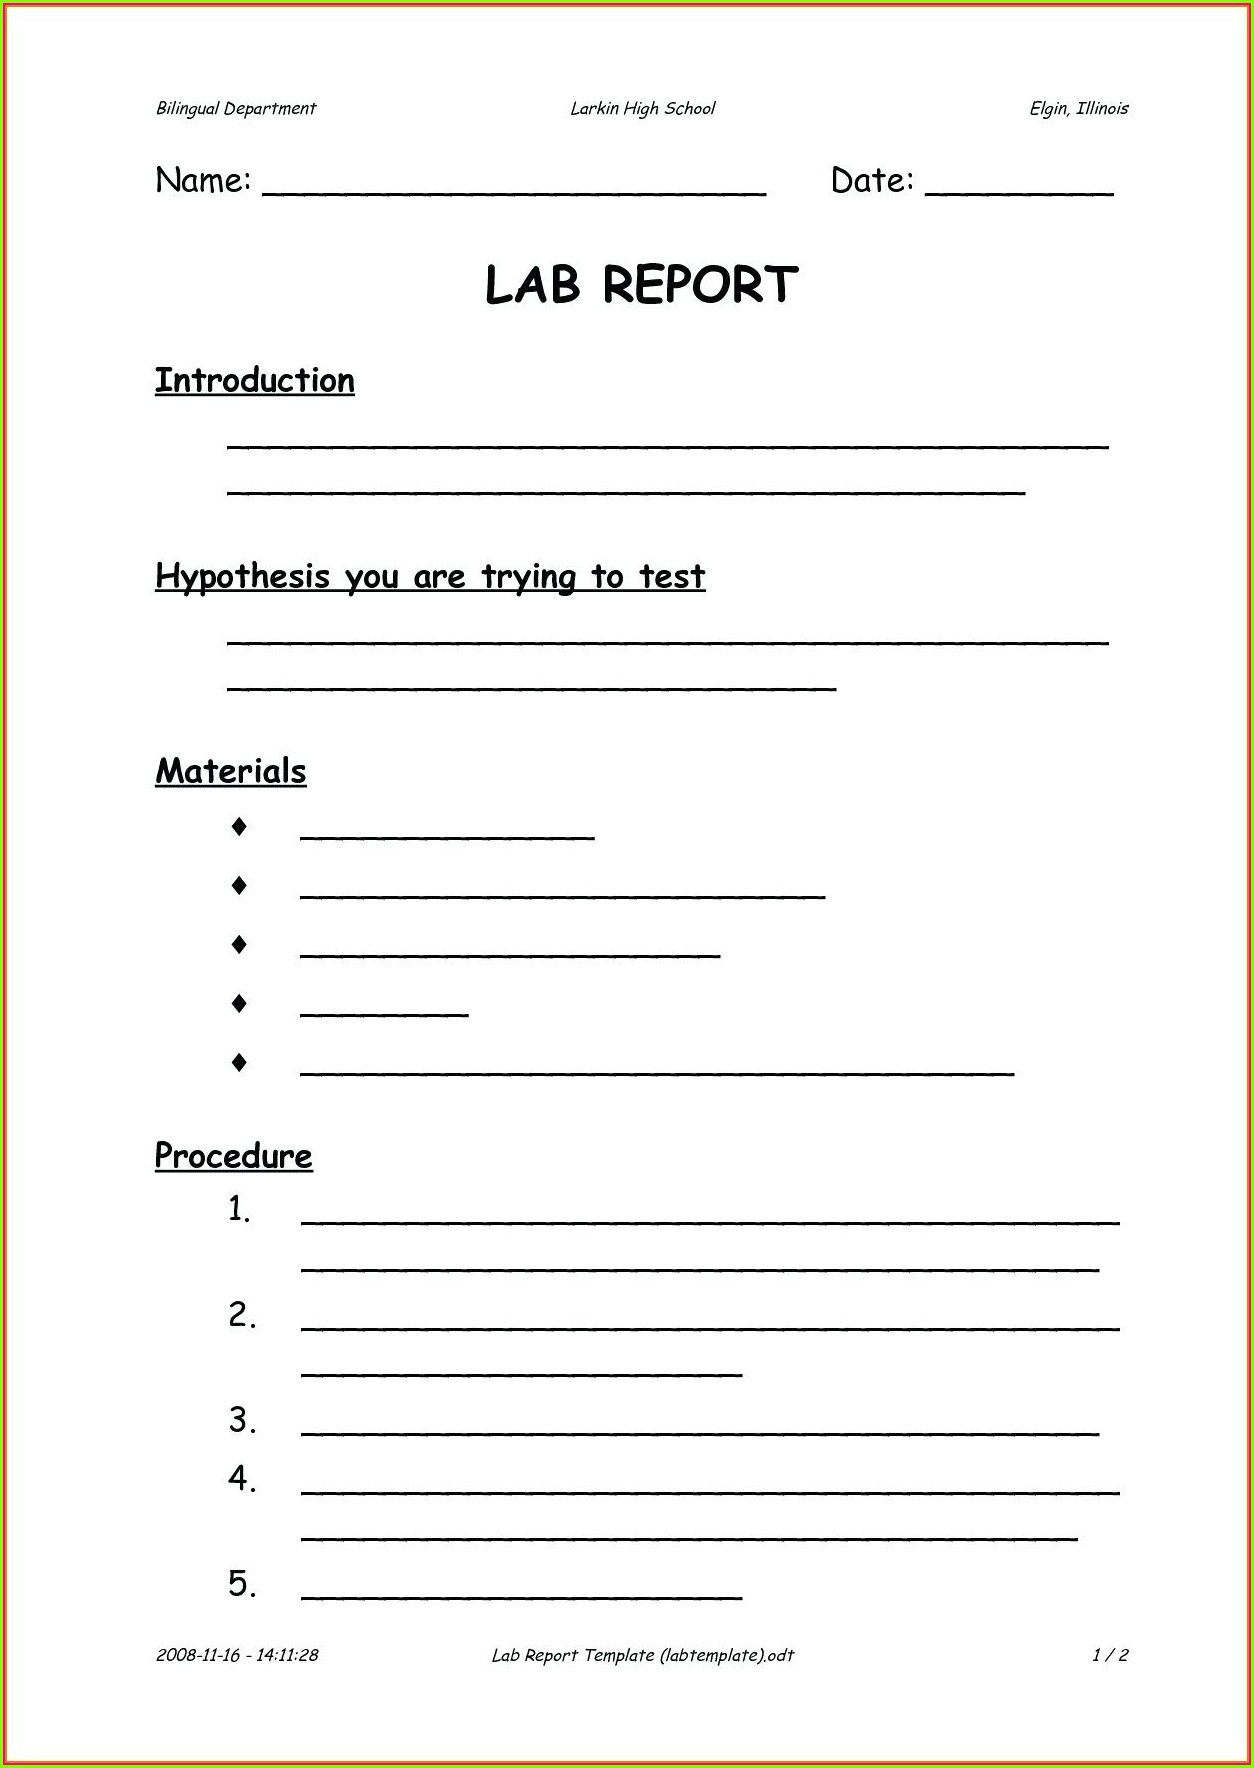 Scientific Method Worksheet 4th Grade High School Scientific Method Worksheet Printable Worksheets